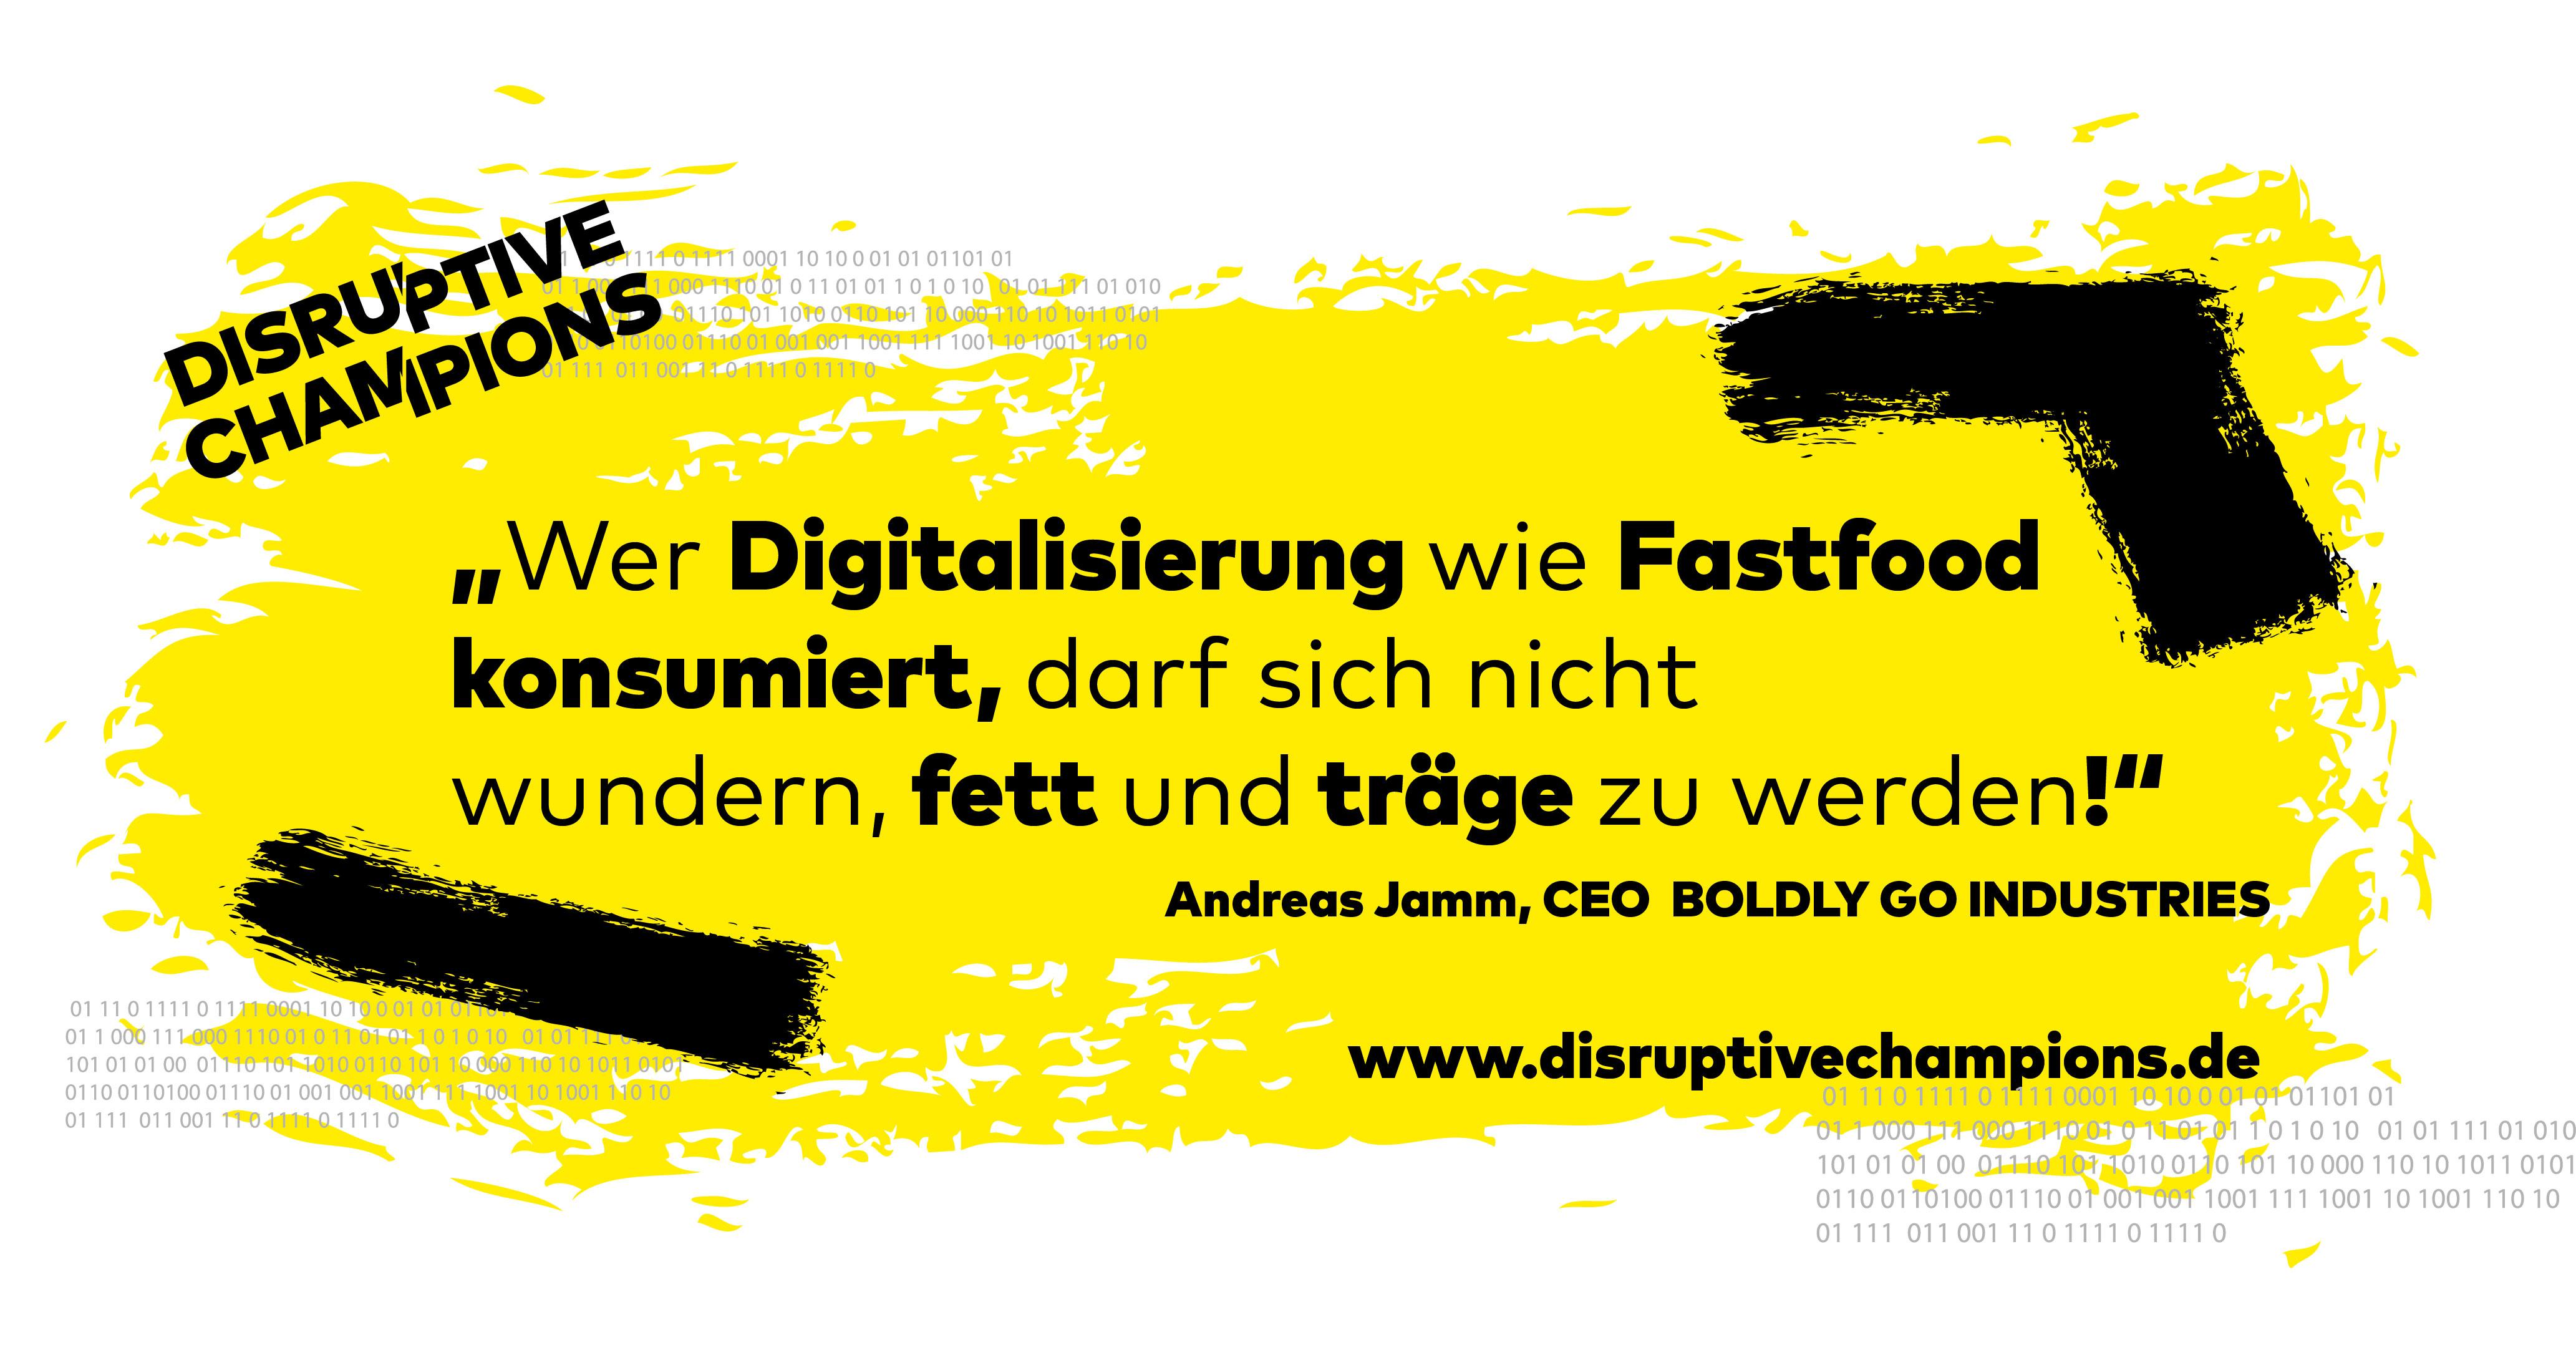 Disruptive Thought, Digitalisierung